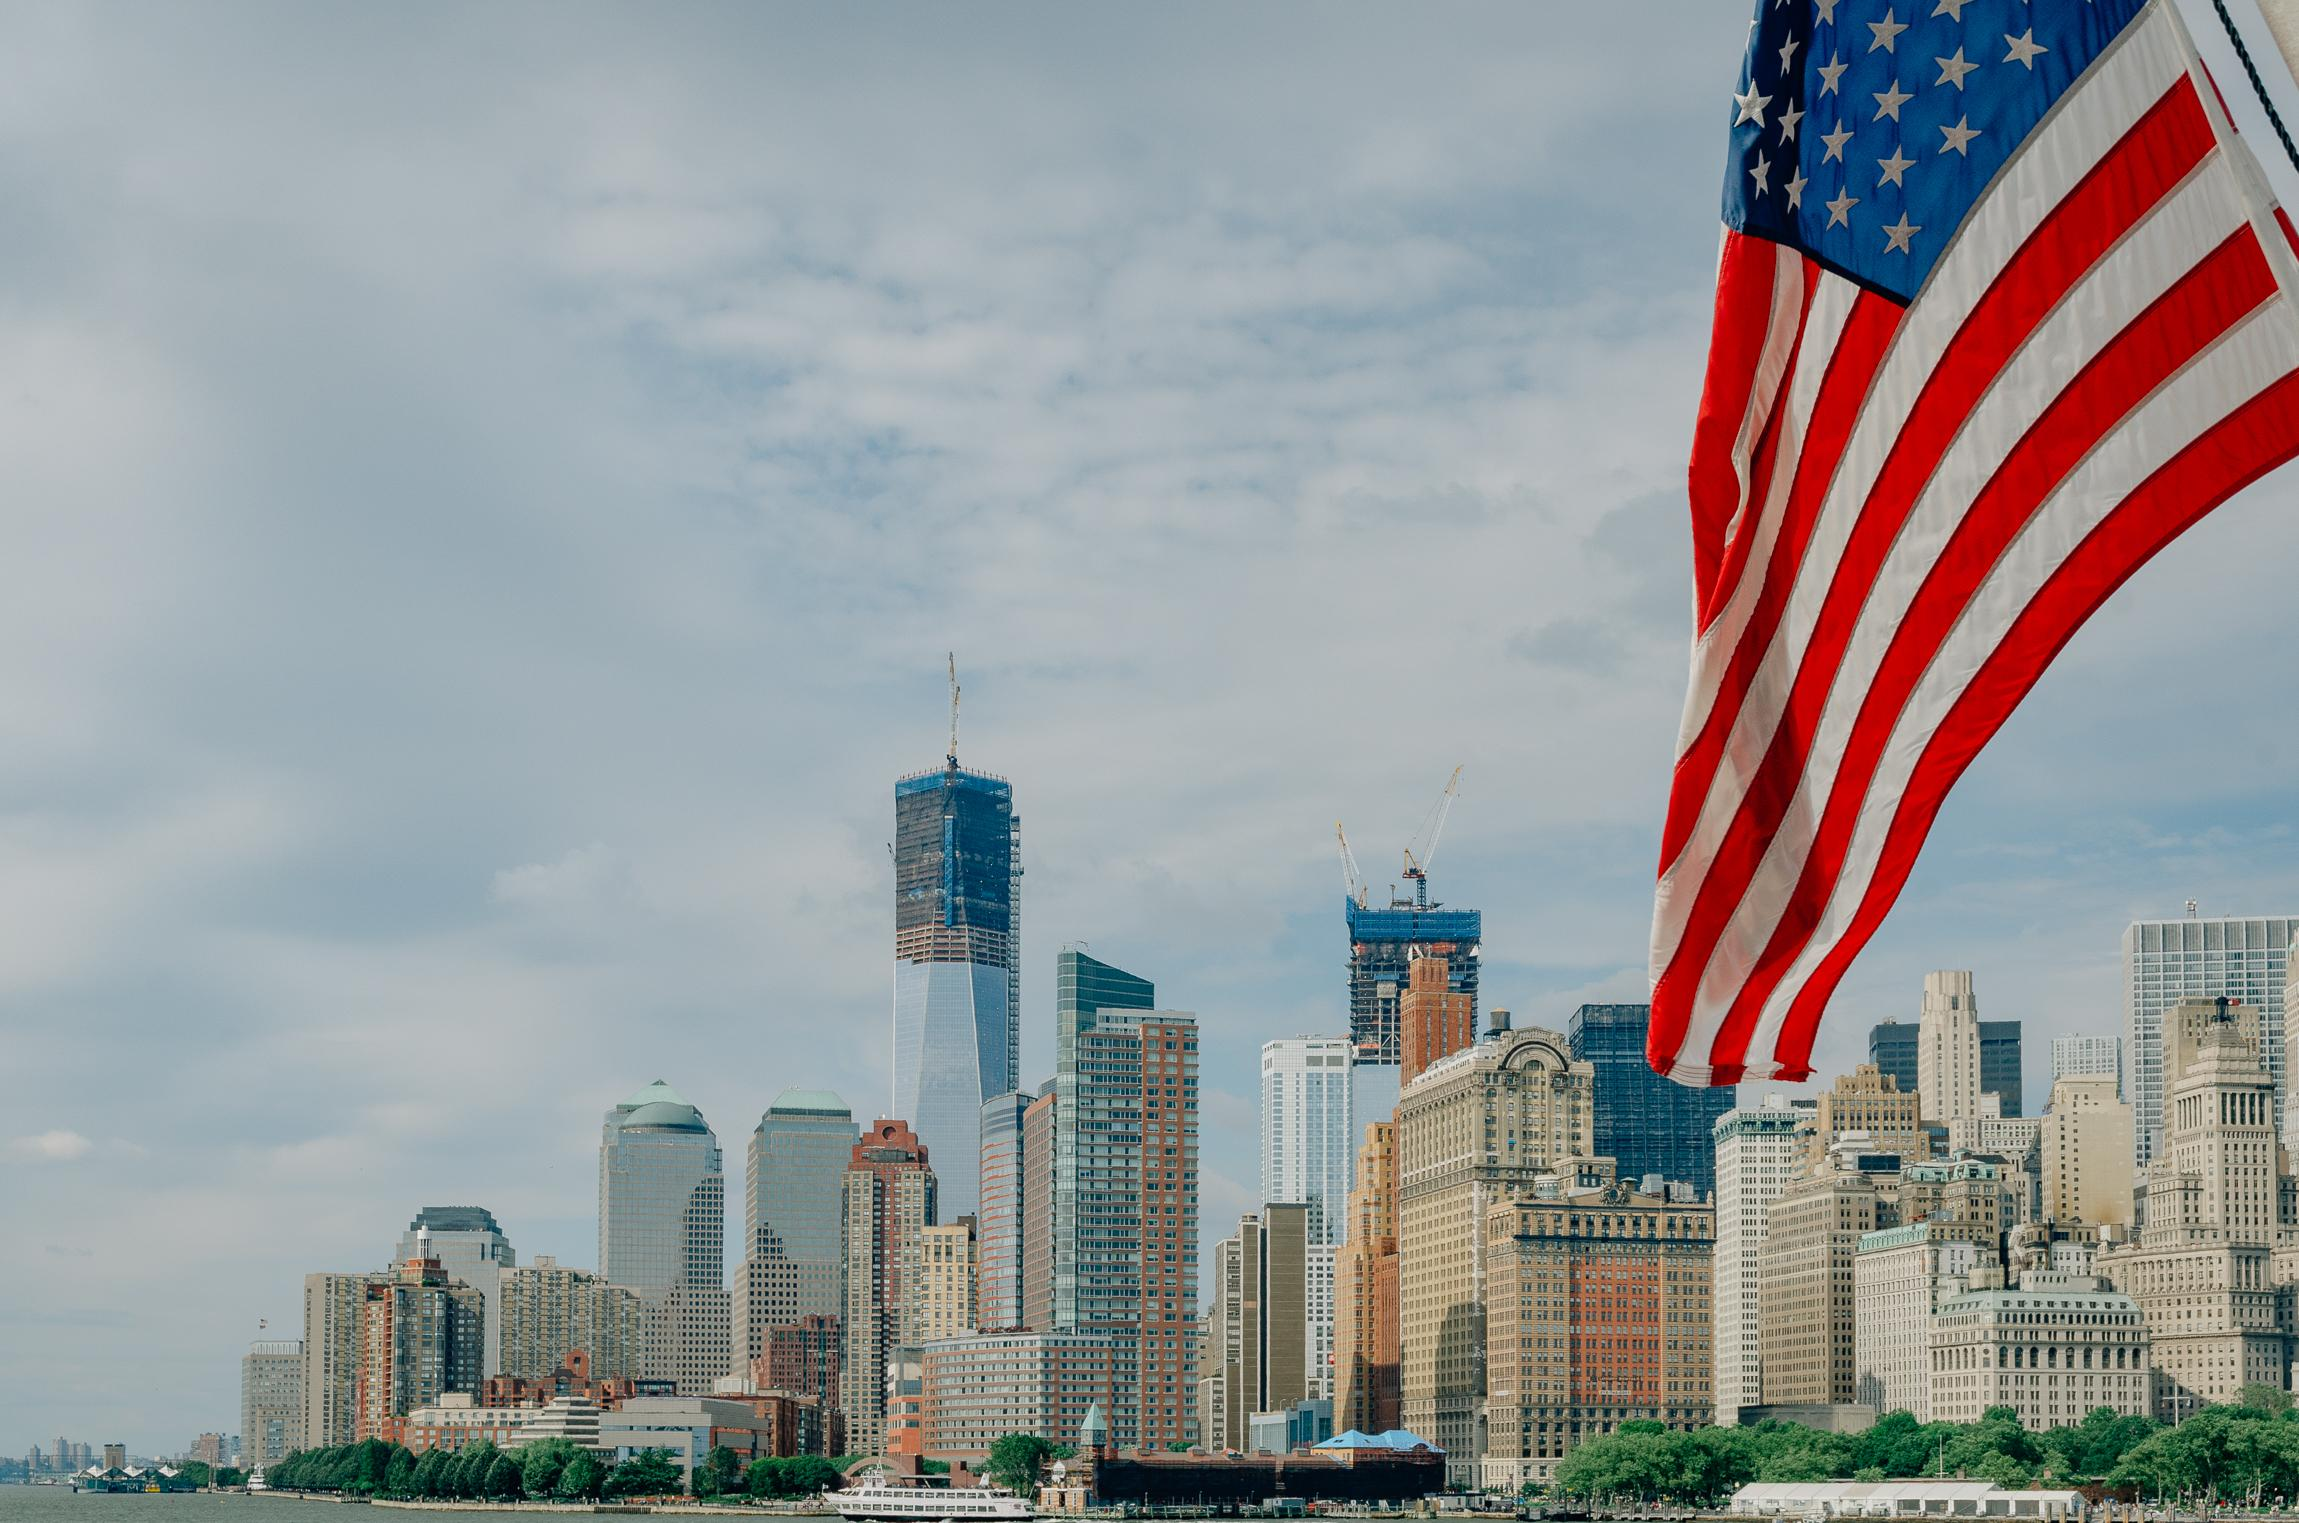 Liberty Island Polo Classic - 2012-0602-DSC_2839_45975